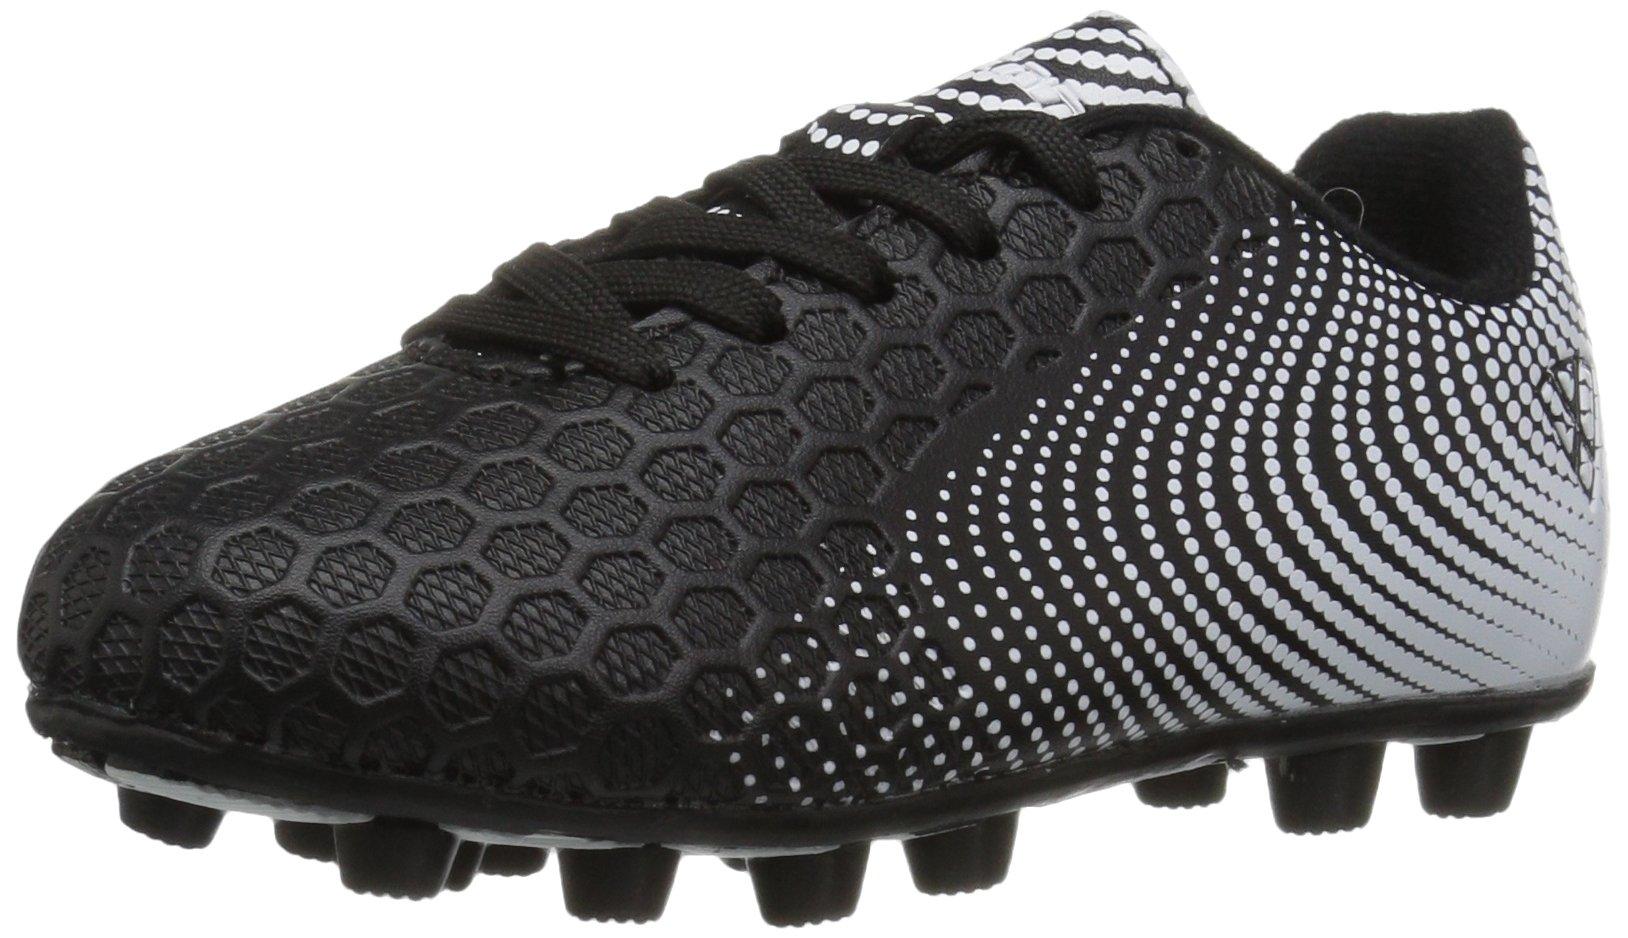 Vizari Unisex-Kids Stealth FG Size Soccer-Shoes, Black/White, 10 M US Little Kid